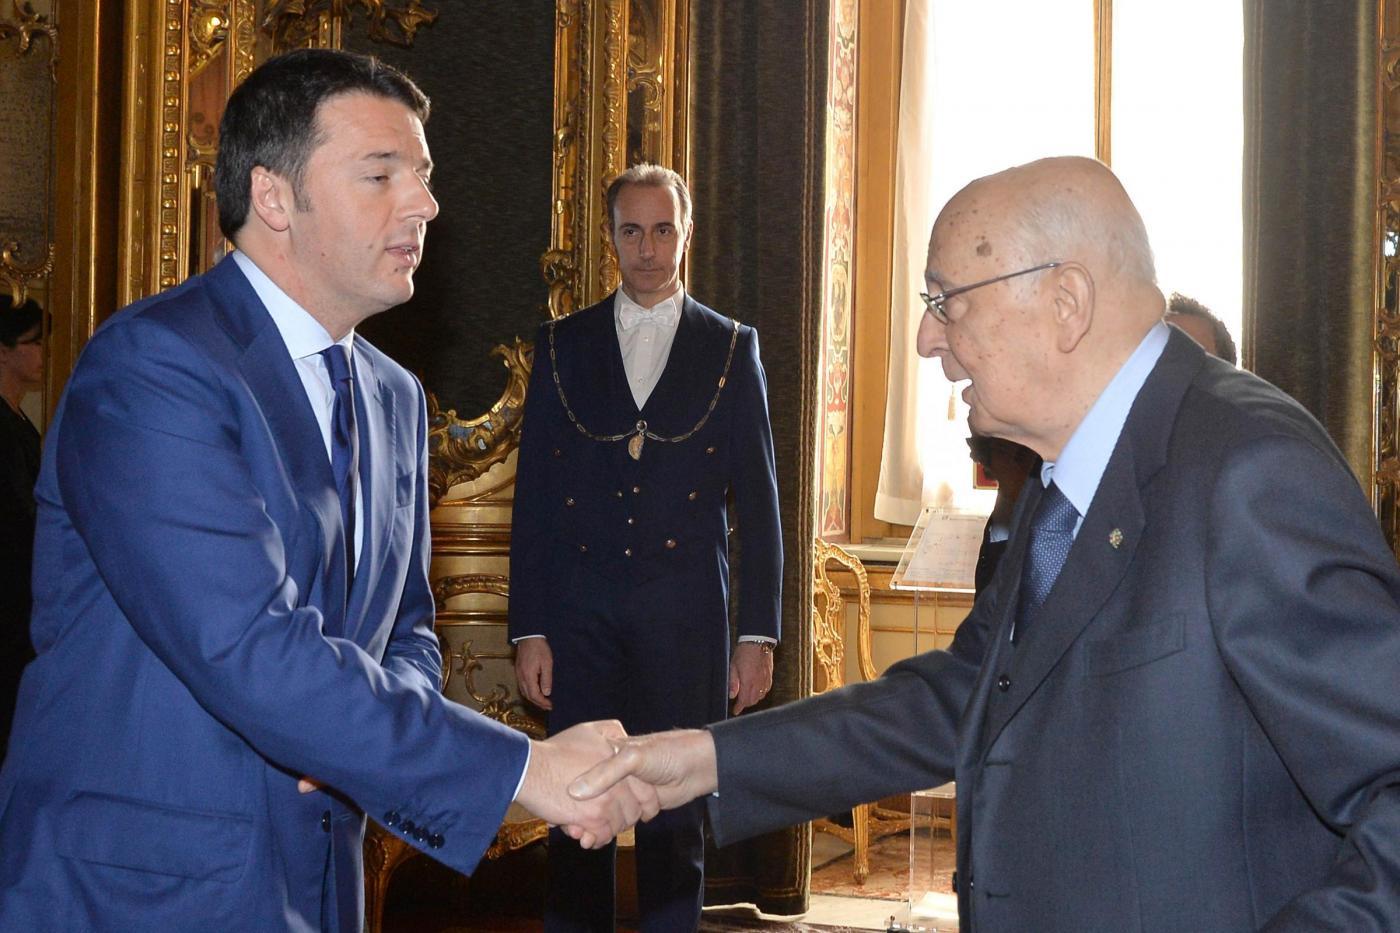 Referendum trivelle, Napolitano: 'Astensione legittima'